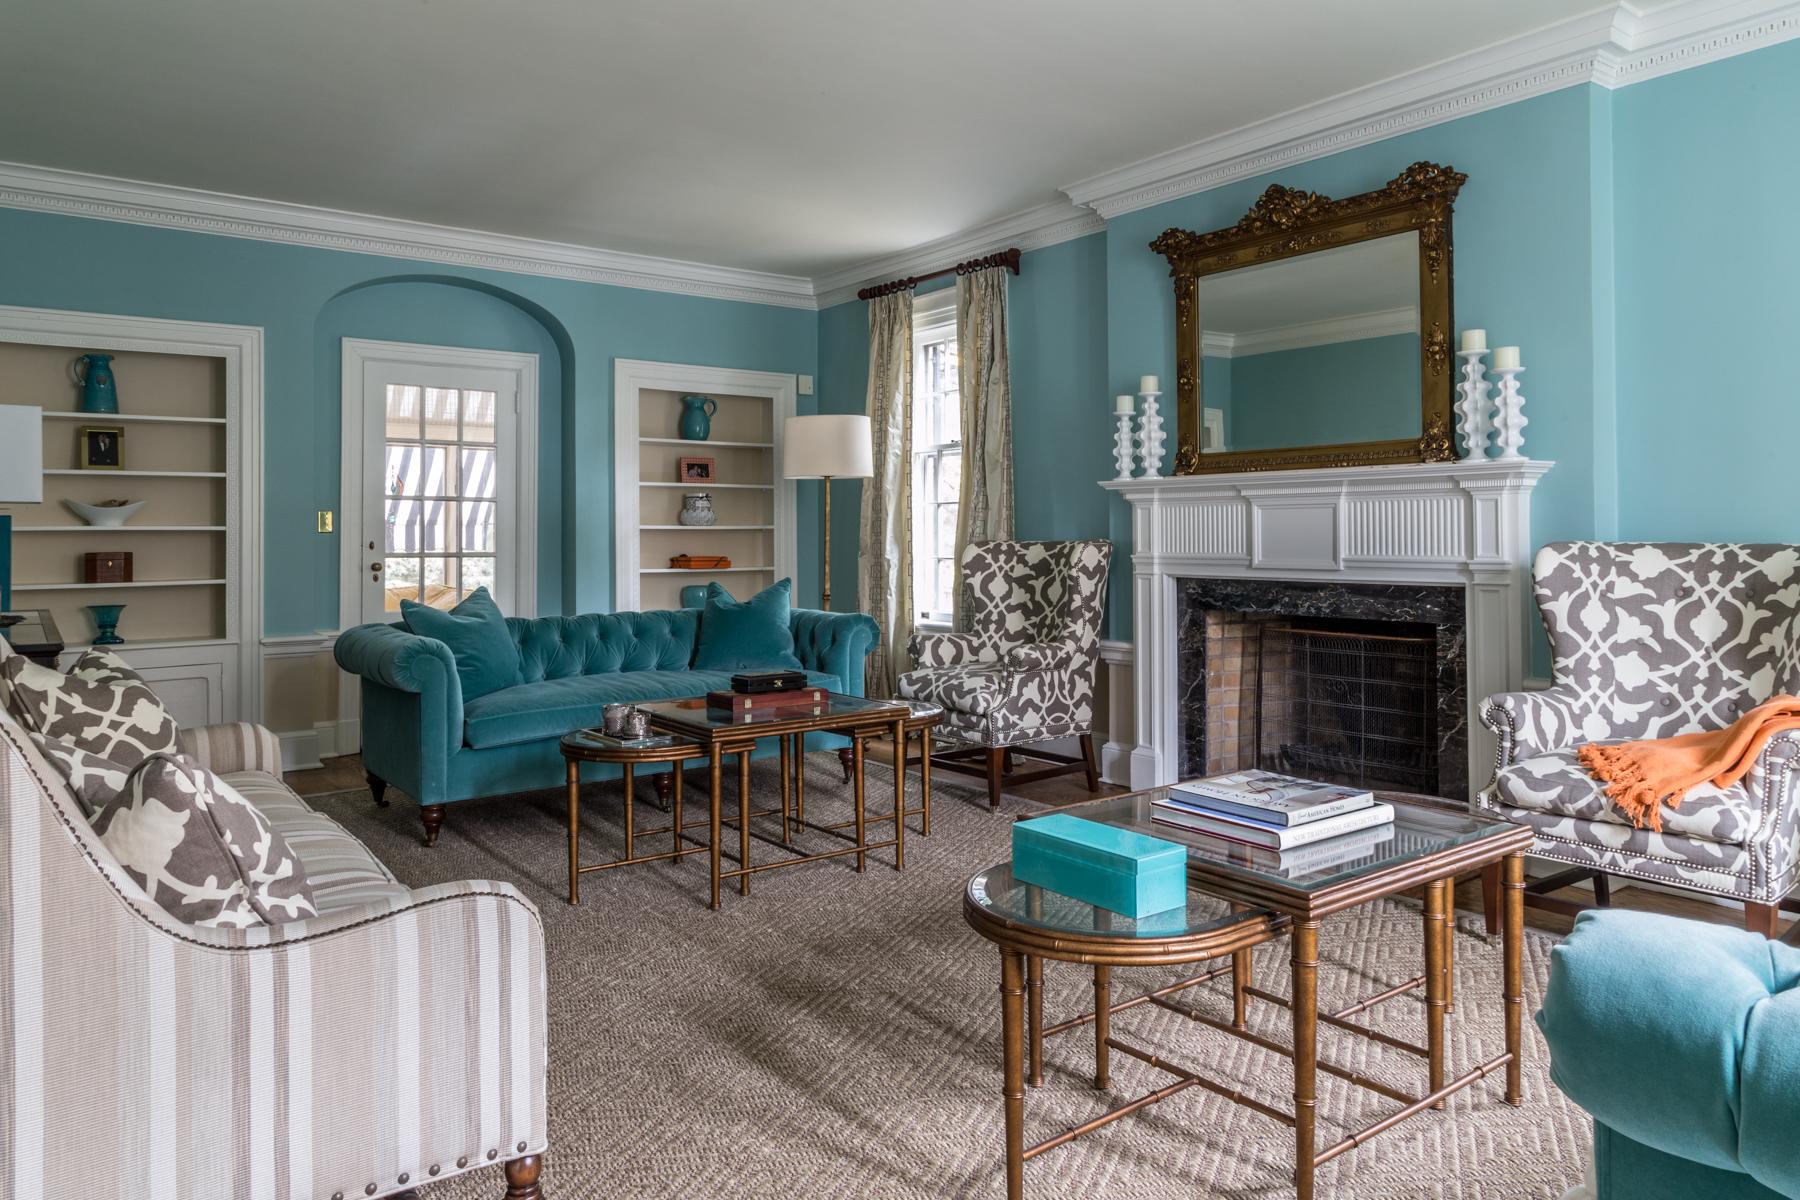 Top New Jersey interior designer Swift Morris